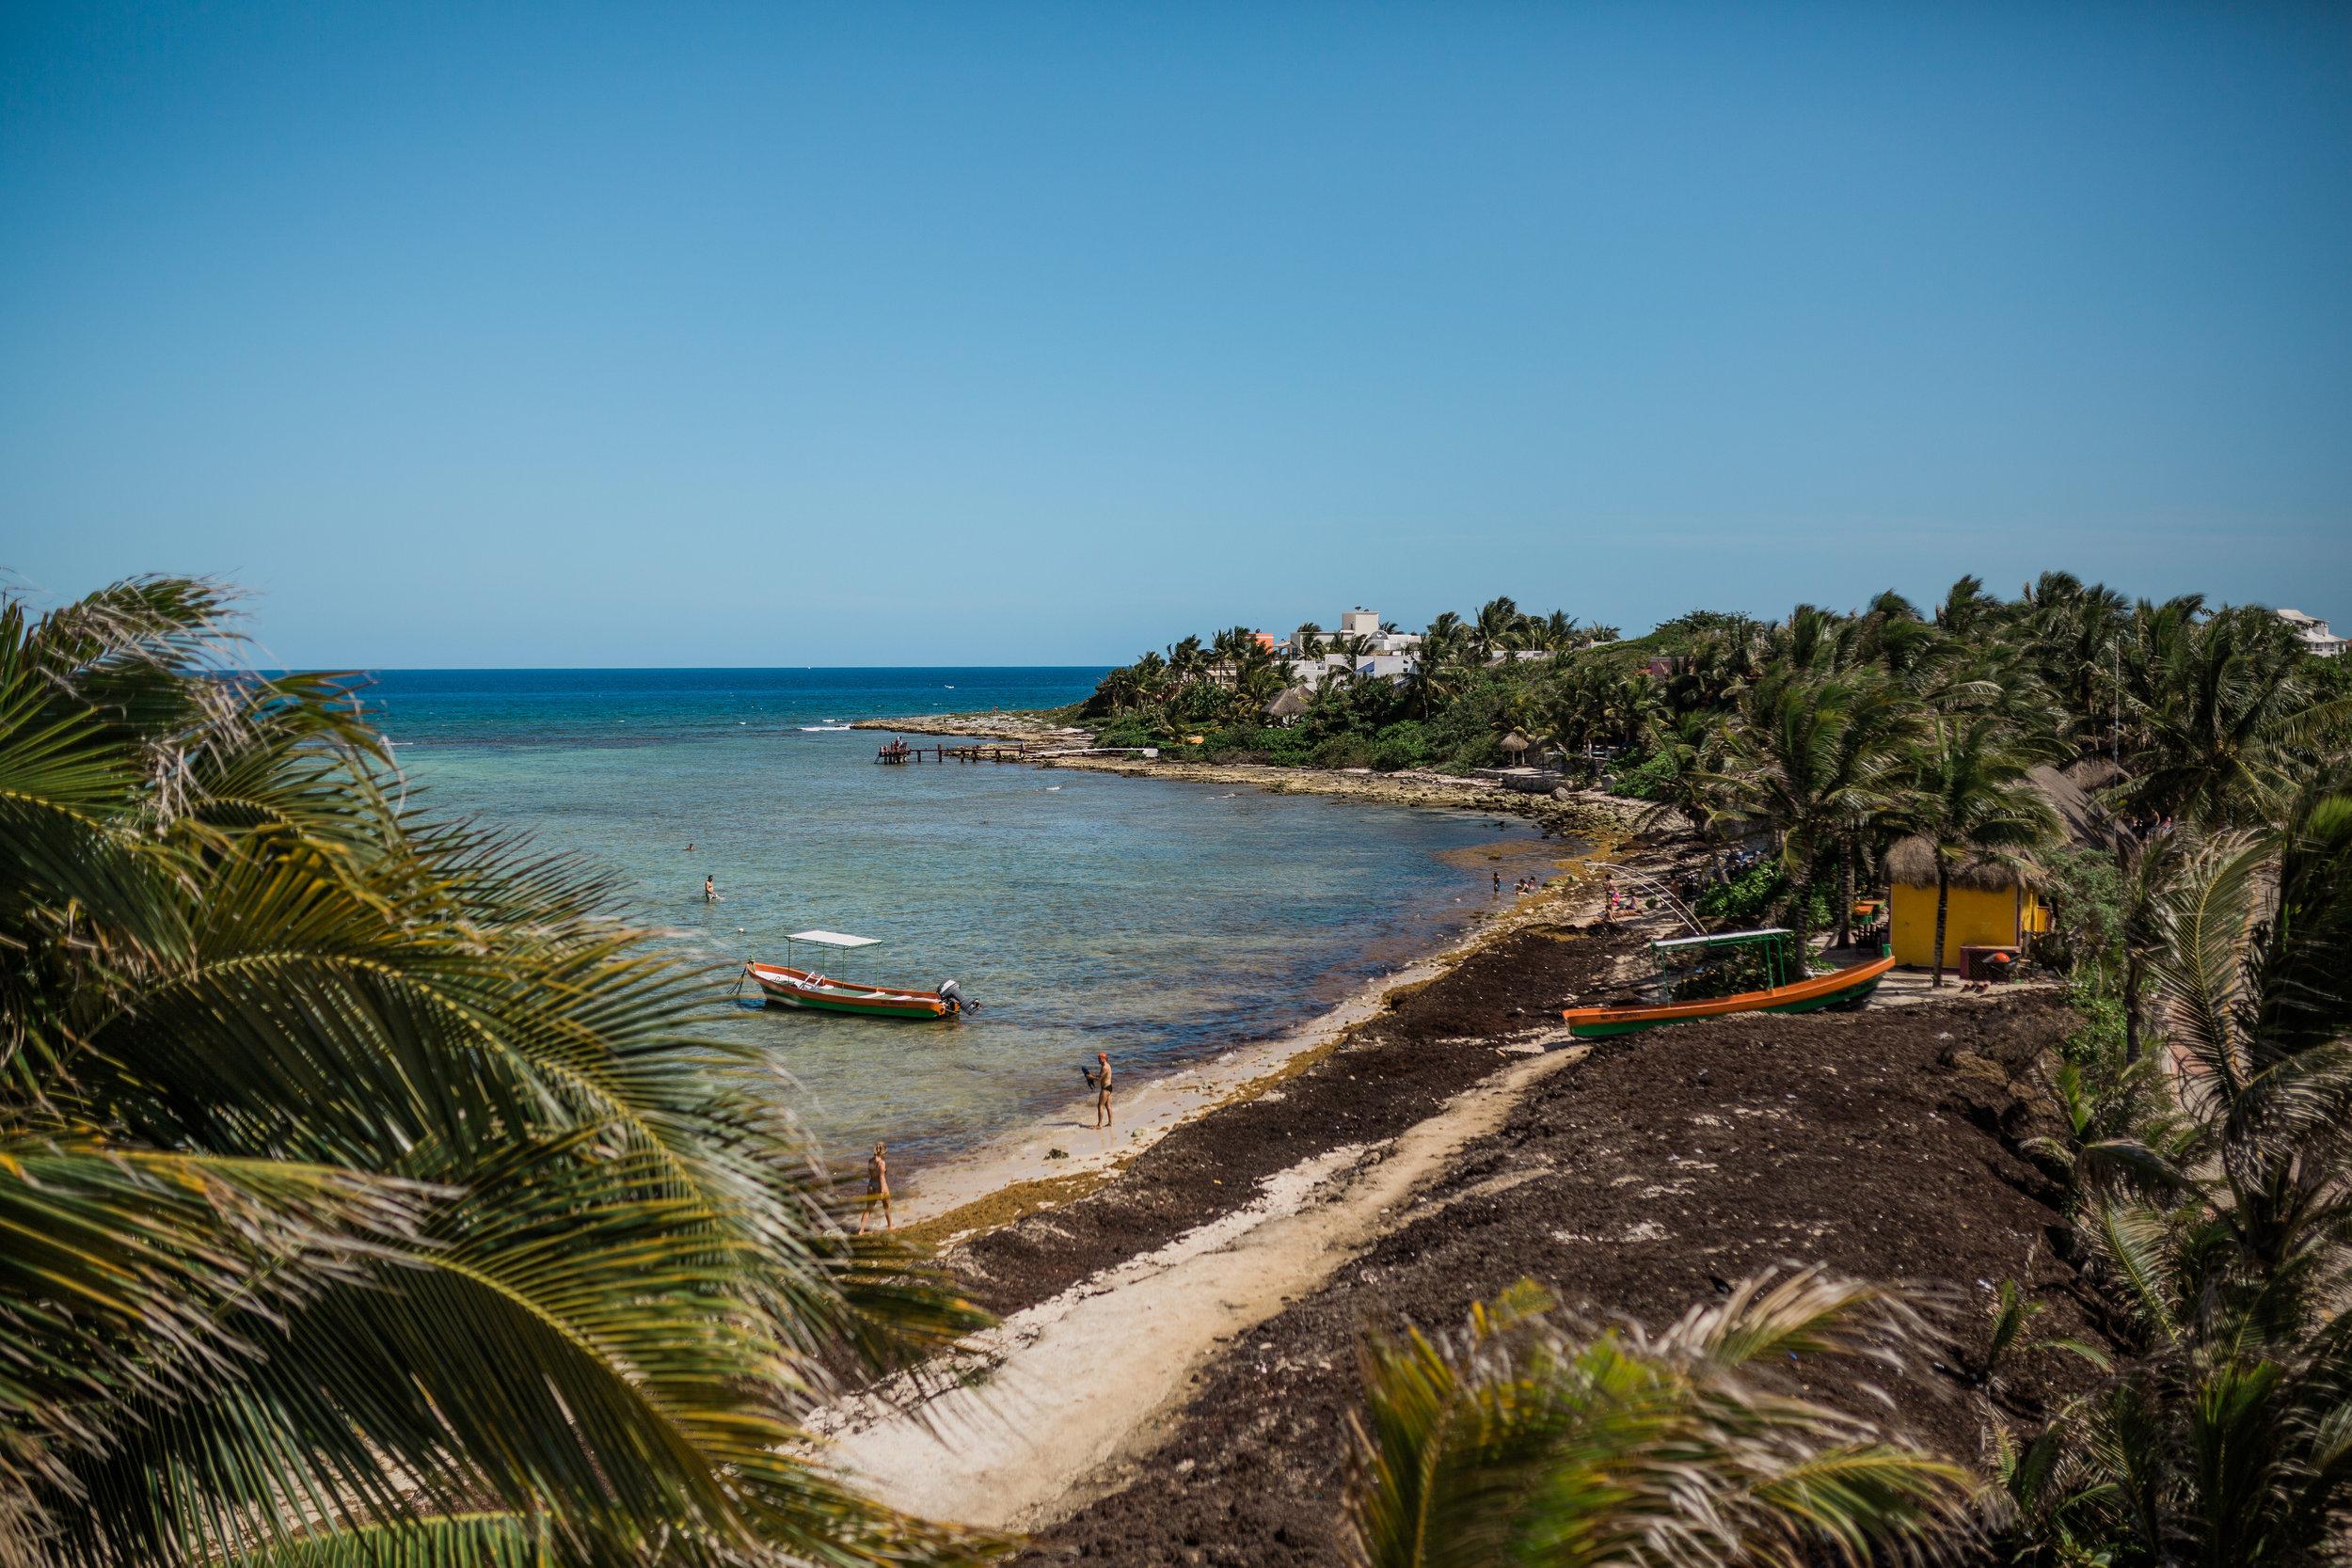 Nicole-Daacke-Photography-beachfront-akumal-destionation-wedding-tulum-mexico-elopement-photographer-destination-wedding-inspiration-sunset-champagne-pop-boho-bride-ocean-tropical-bohemian-tulum-wedding-photos-100.jpg